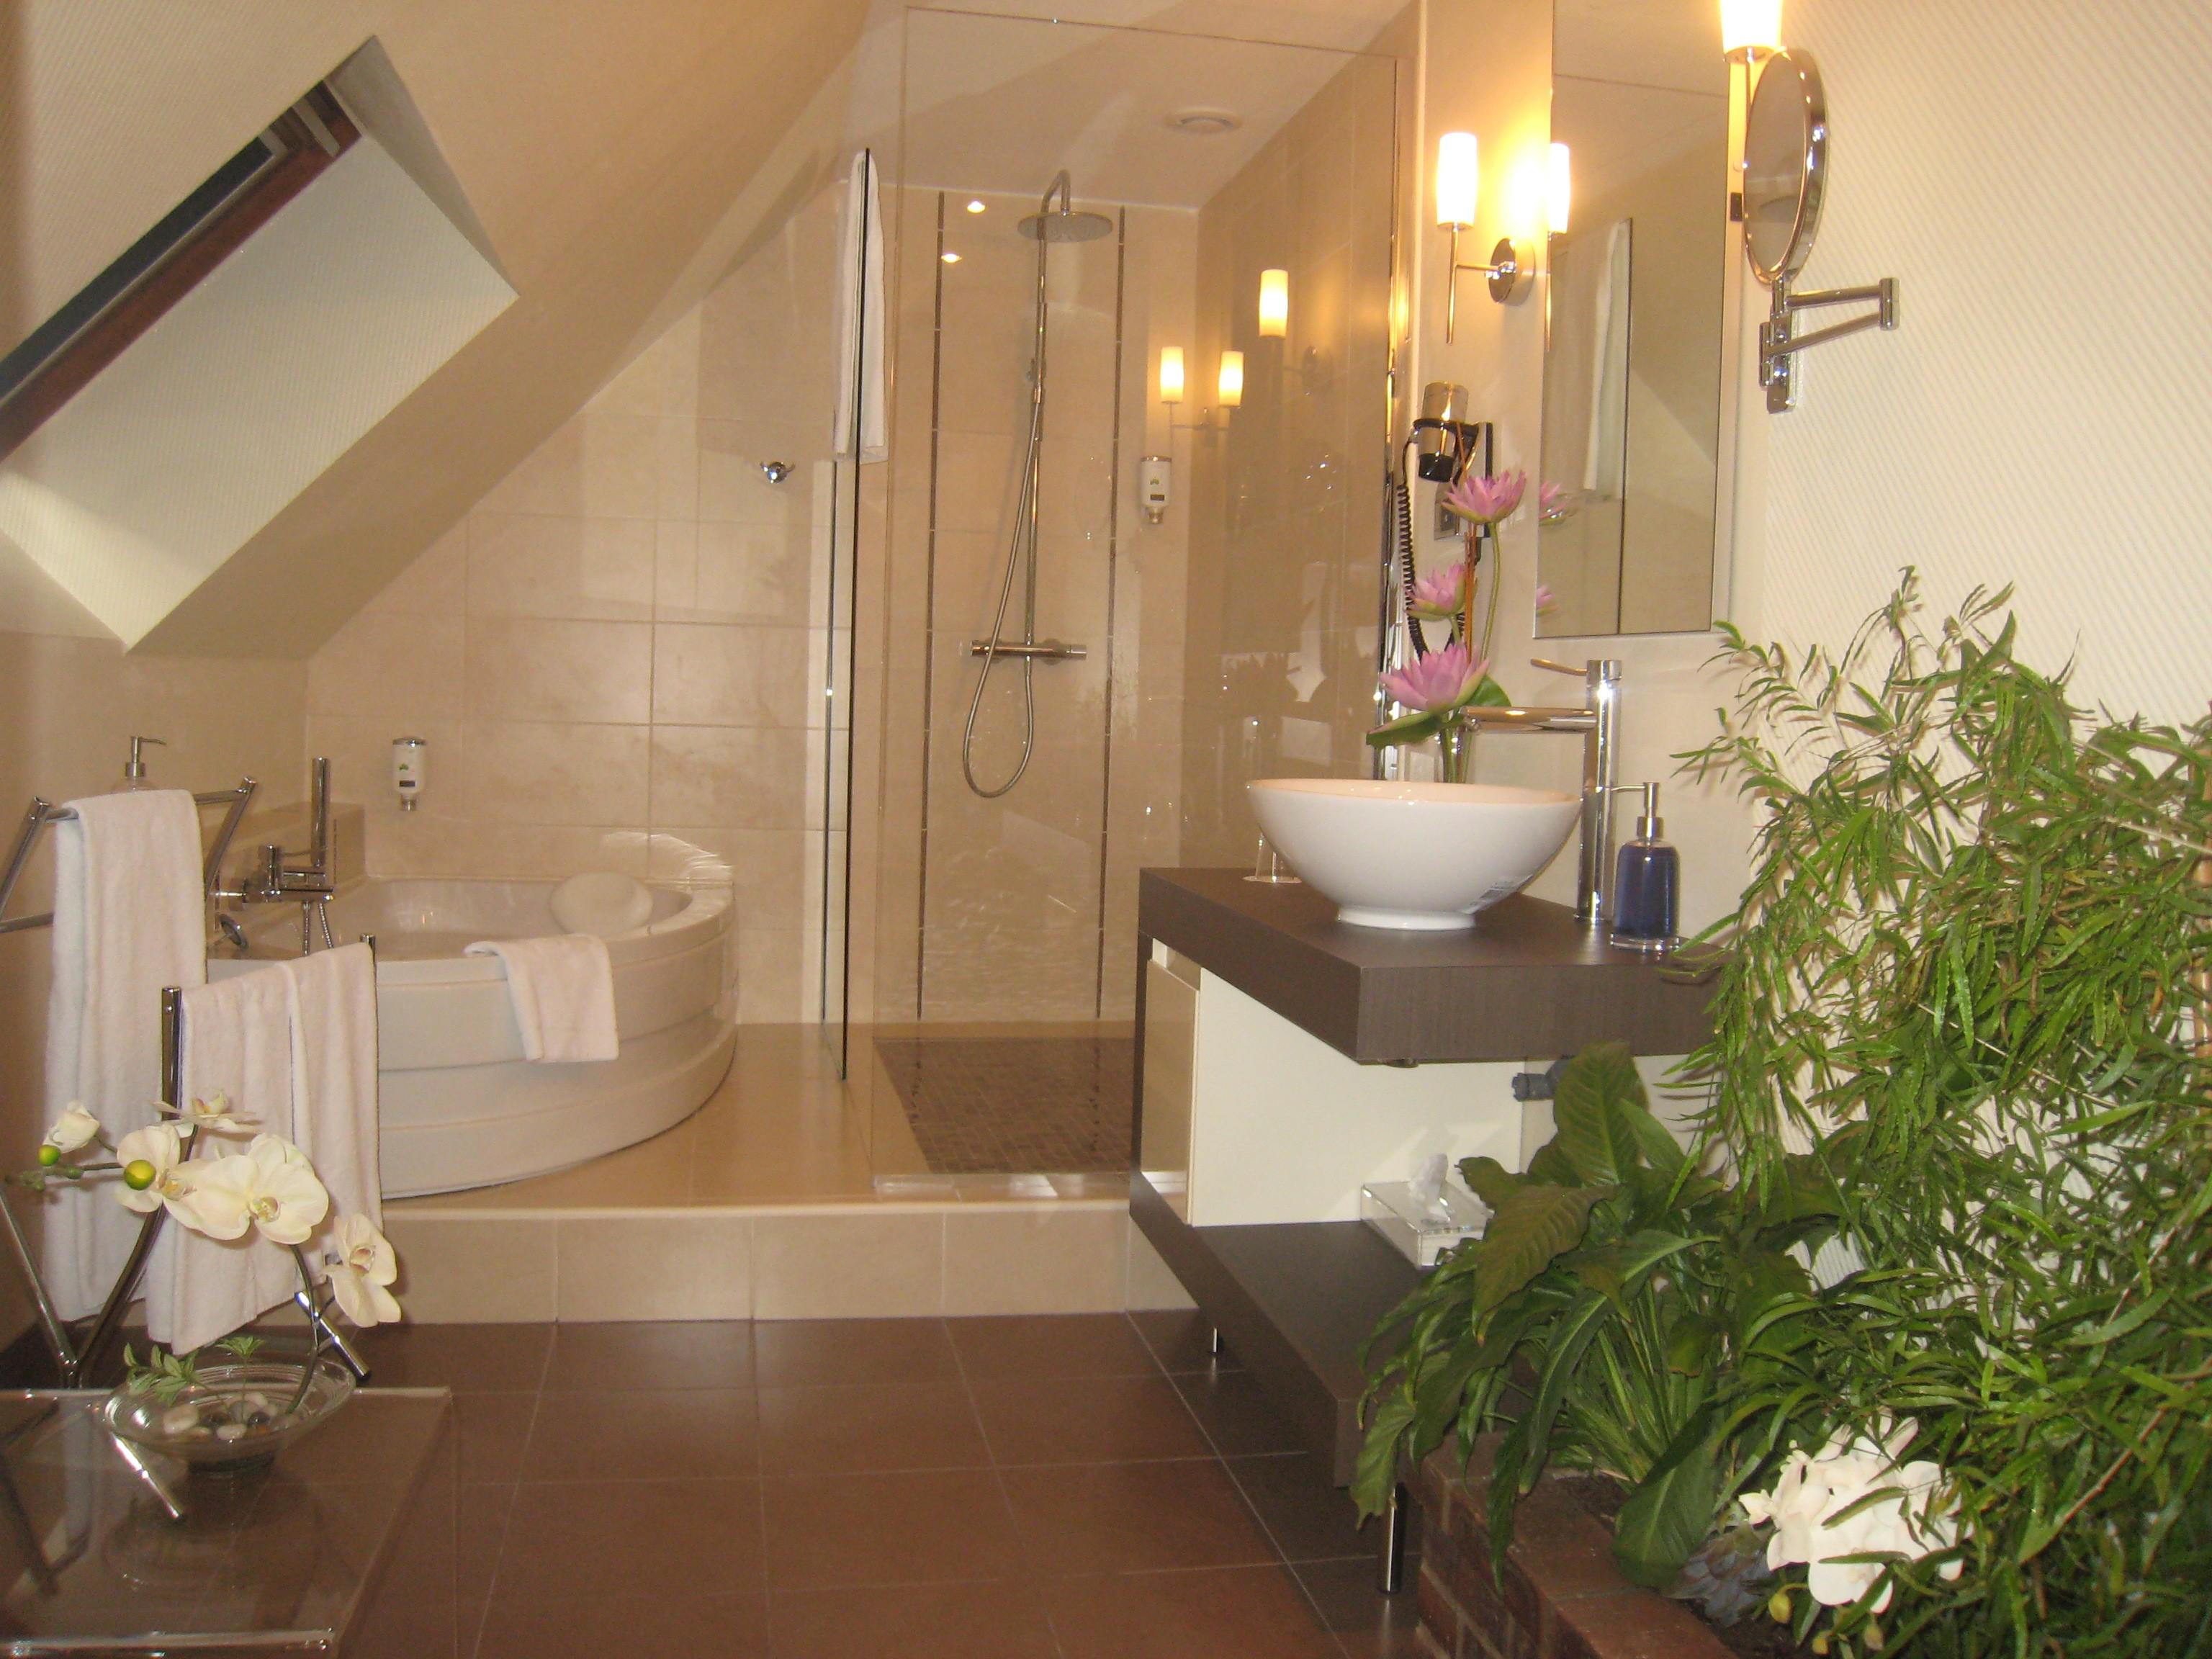 Hotel Relais Saint Jean  U00e0 Troyes